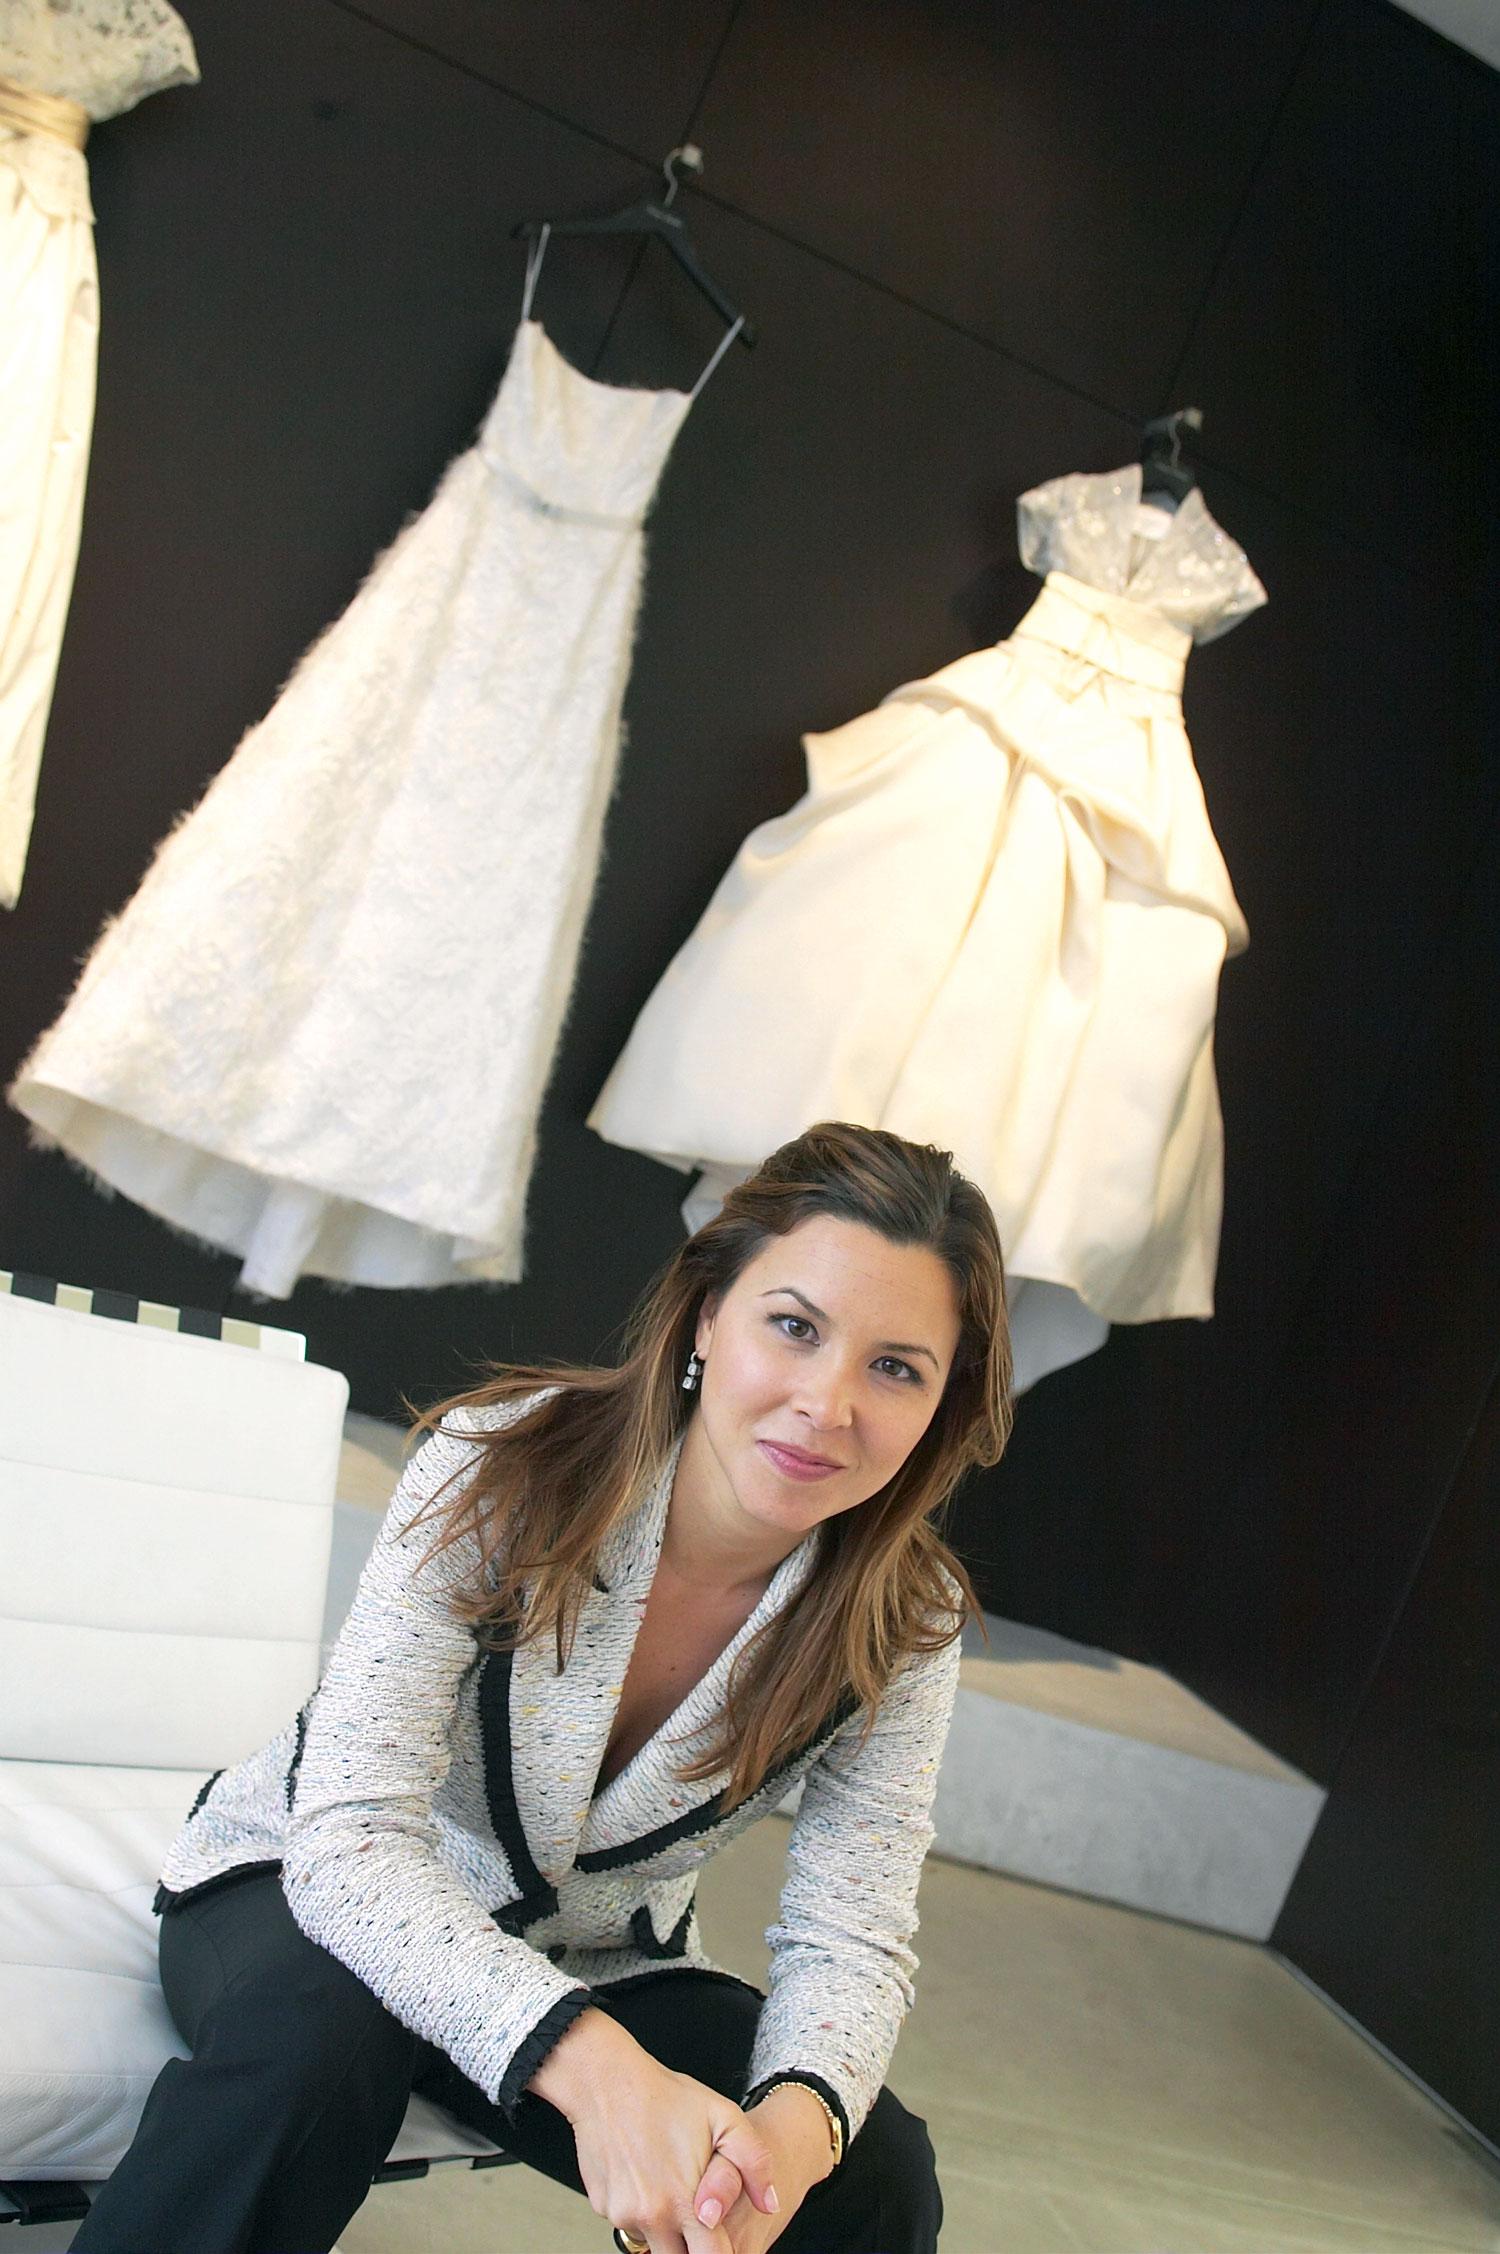 Monique Lhuillier fashion designer bridal designer wedding dresses interview with Inside Weddings magazine